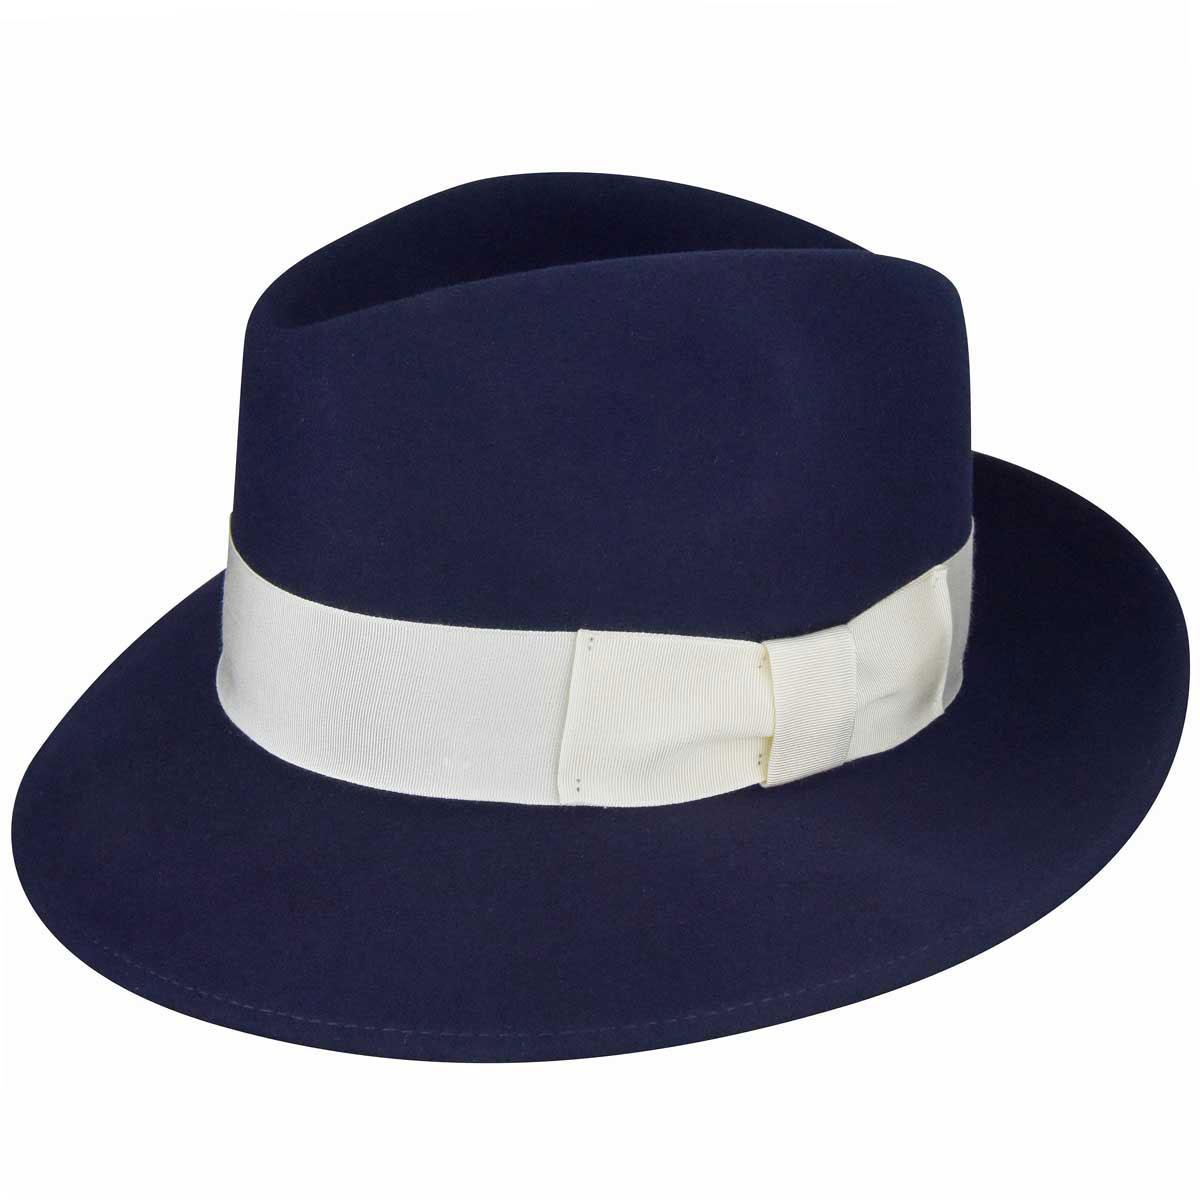 1920s Mens Hats – 8 Popular Styles 1920s Bollman Collection Fedora $100.00 AT vintagedancer.com